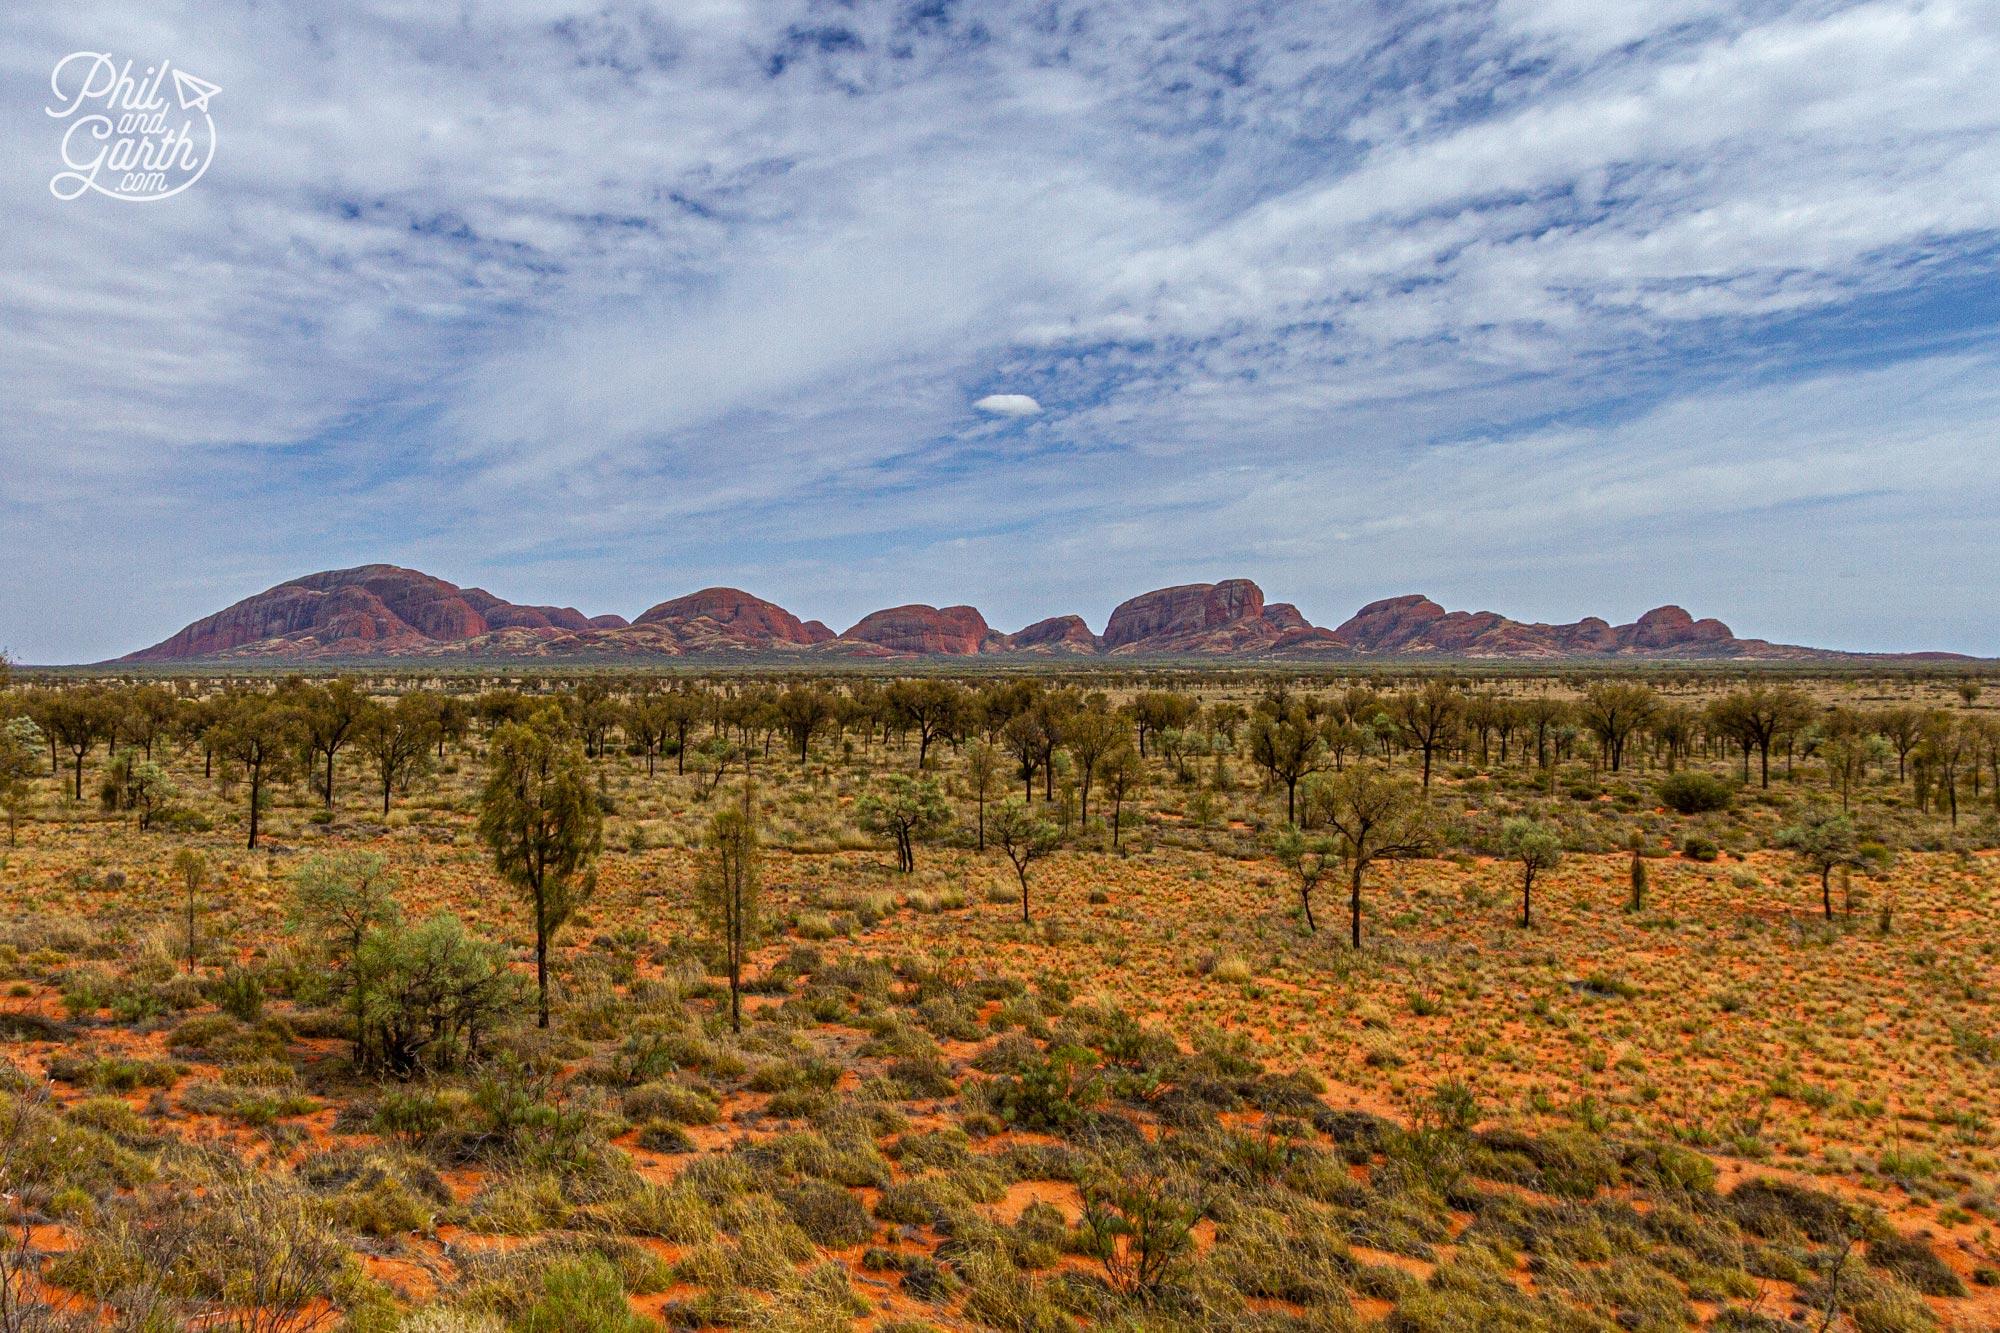 Day 2 of our Uluru itinerary - Kata Tjuta also known as 'The Olgas'